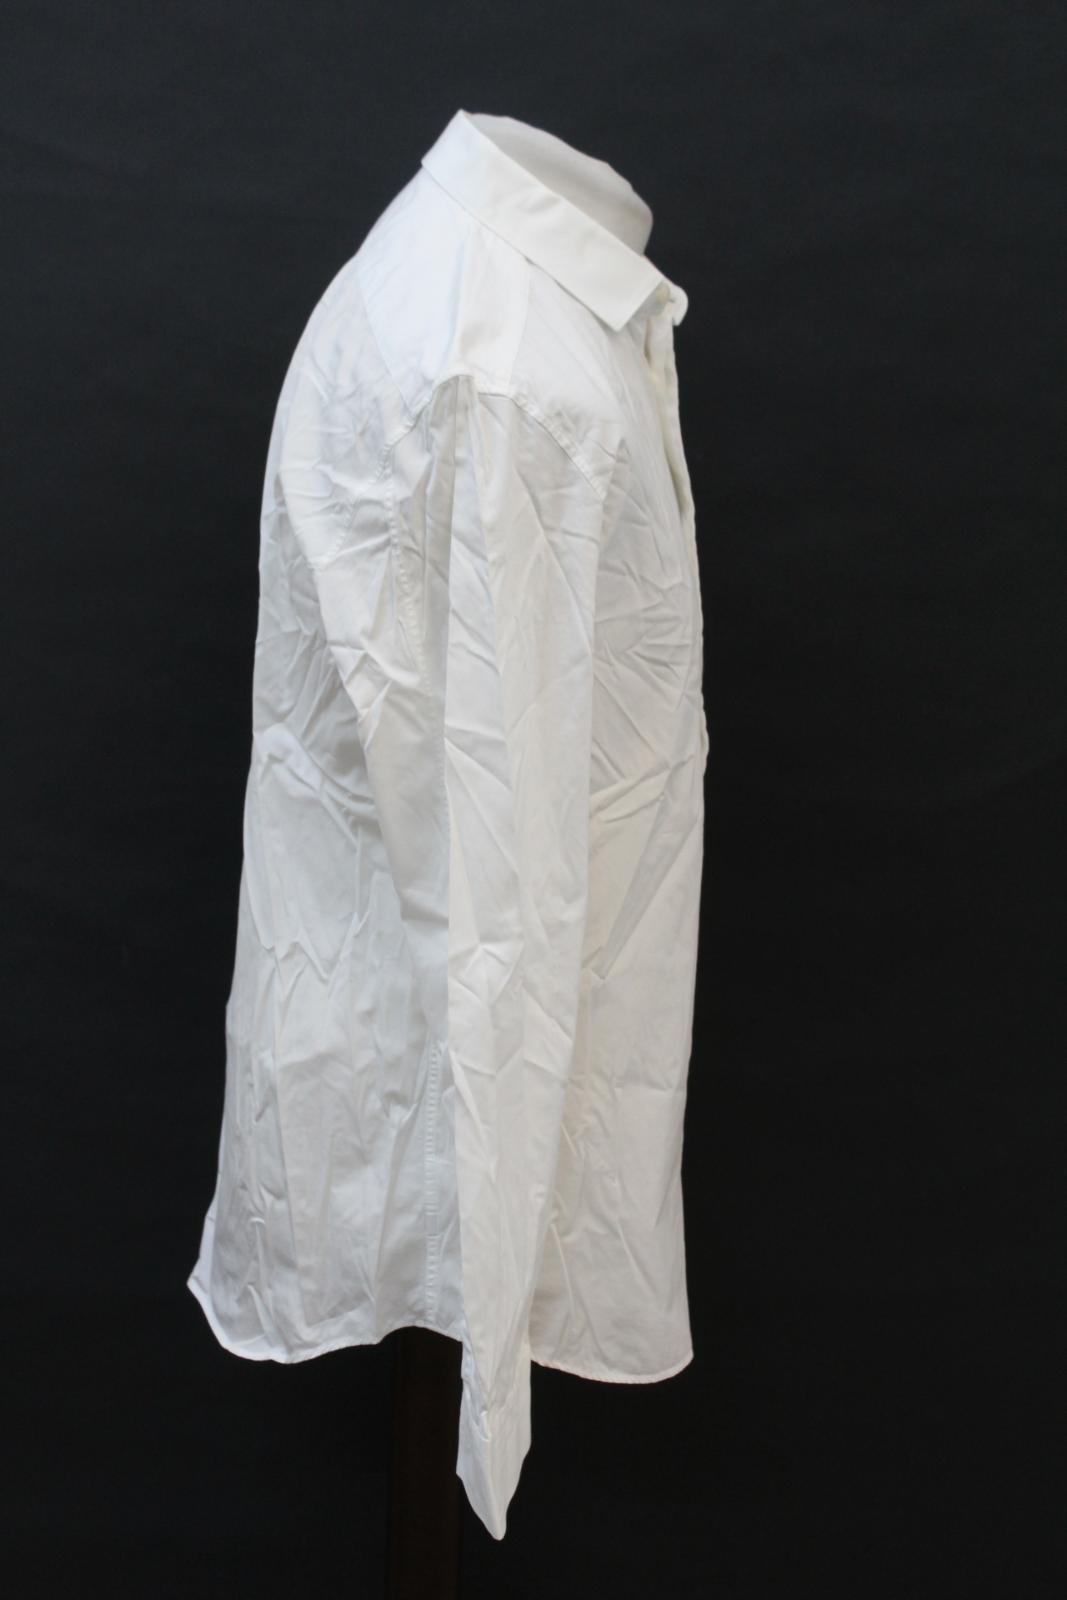 Neil-Barrett-para-hombre-calce-cenido-de-algodon-Blanco-Detalle-De-Cremallera-Botones-Camisa-Cuello miniatura 4